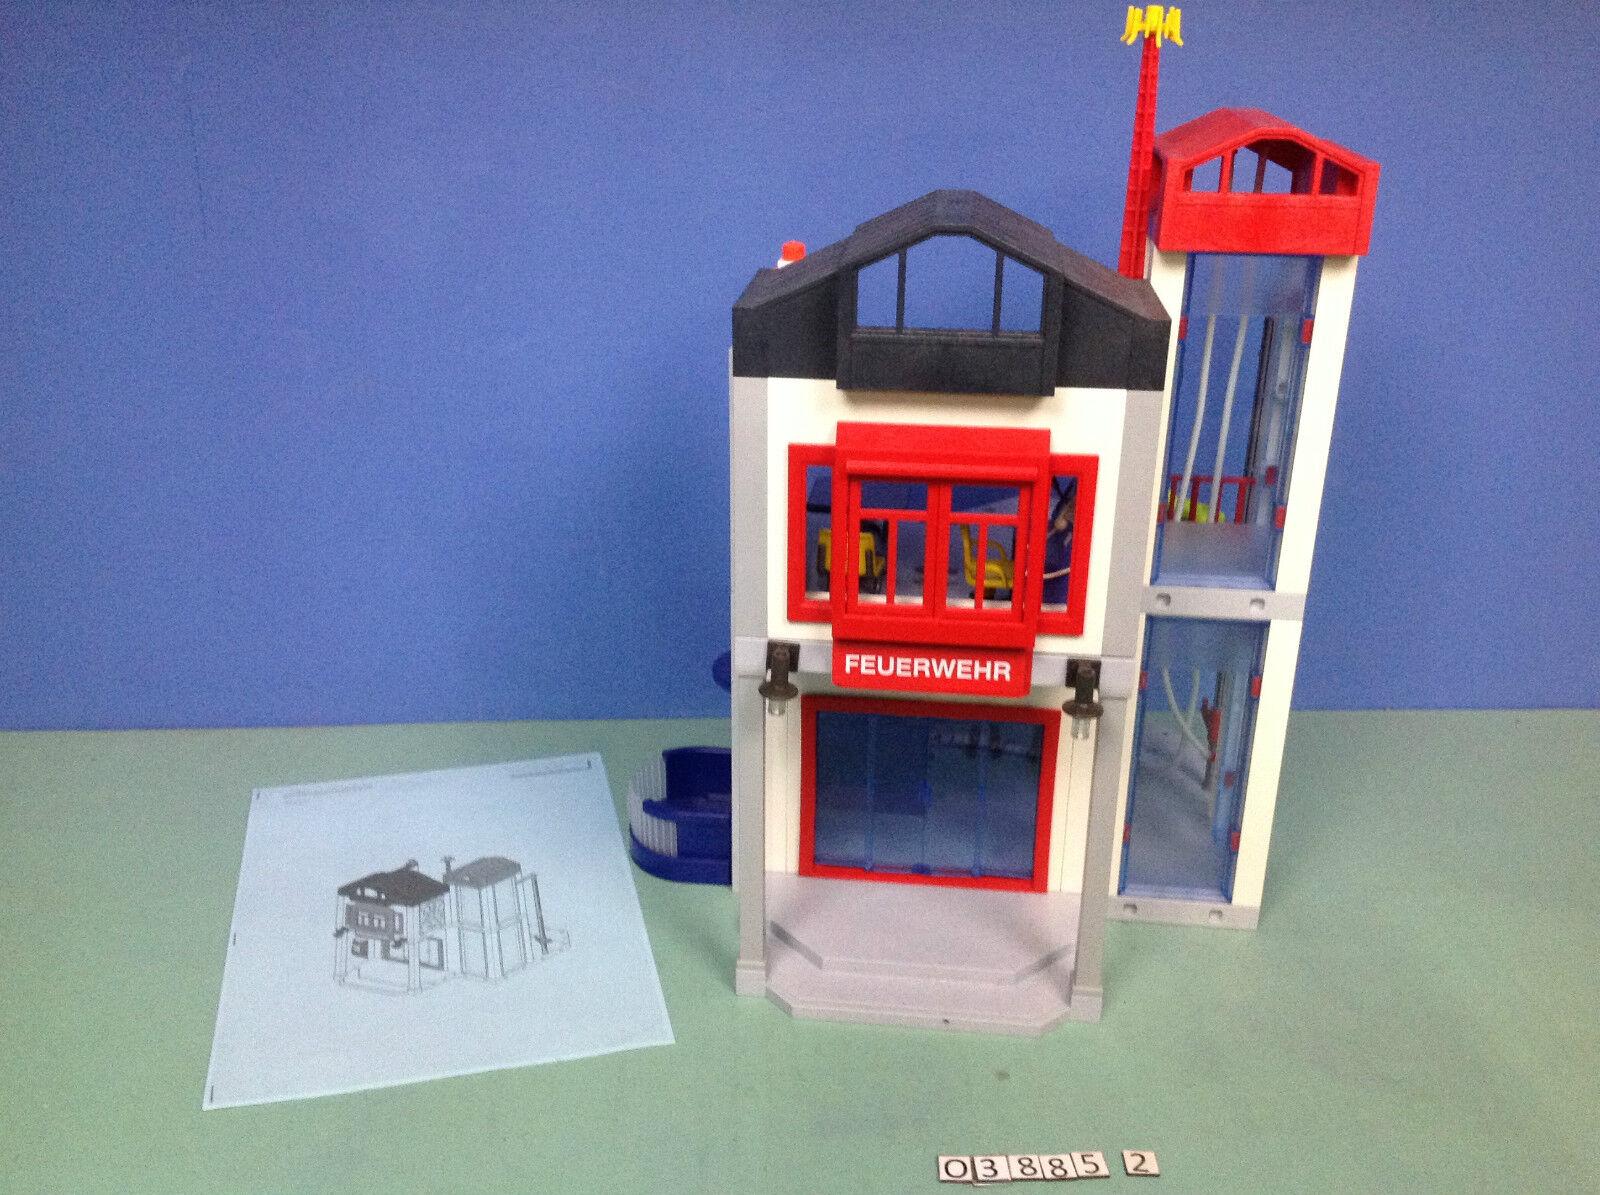 (O3885.2) (O3885.2) (O3885.2) playmobil Caserne de pompiers centre d'entraînement ref 3885 588dd1